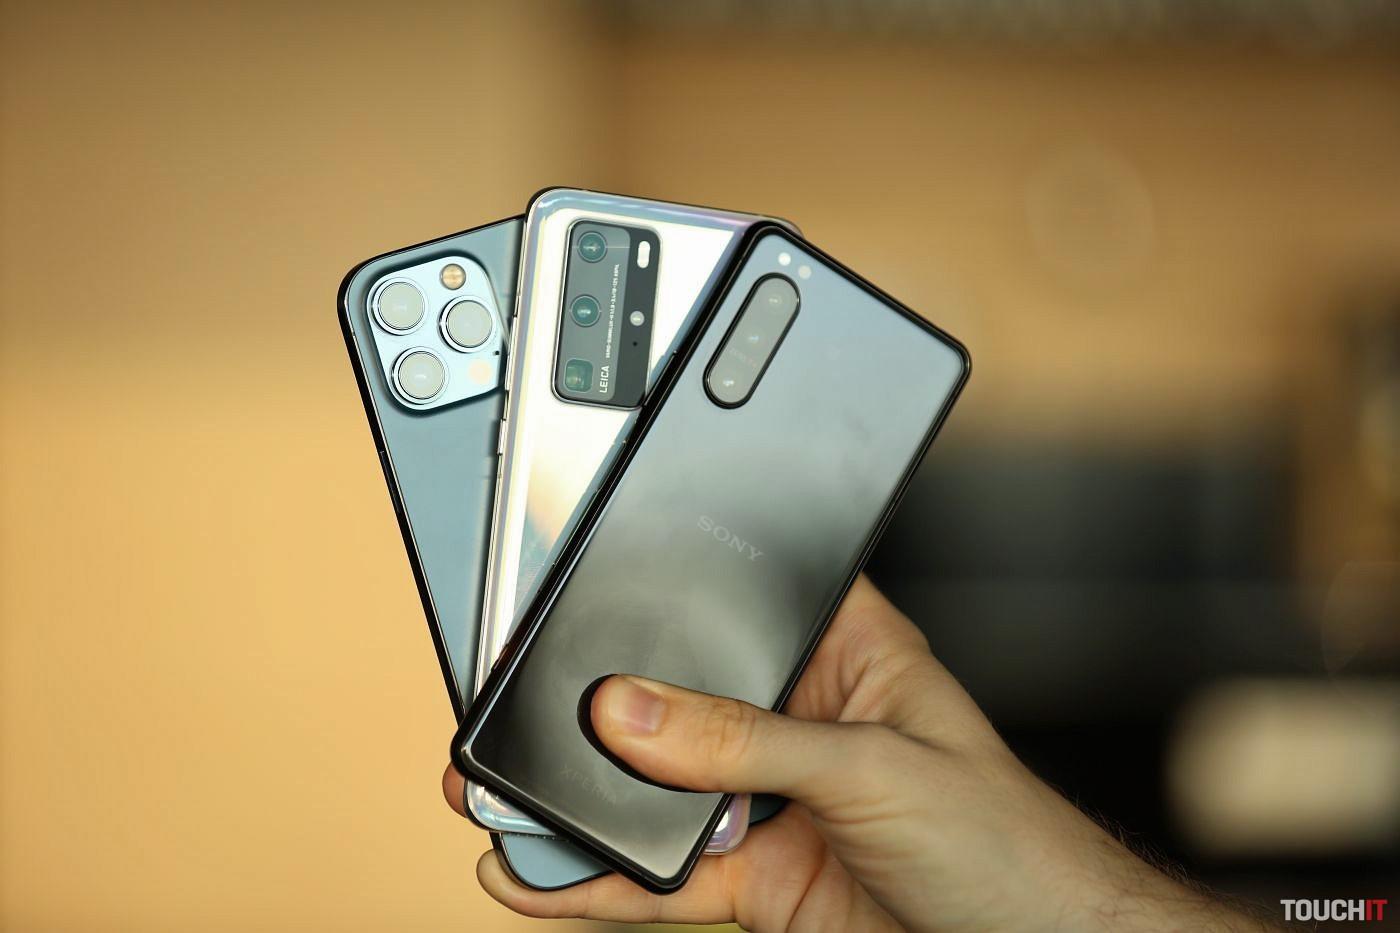 Fototest: Porovnali sme iPhone 12 Pro, Huawei P40 Pro a Sony Xperia 5 II